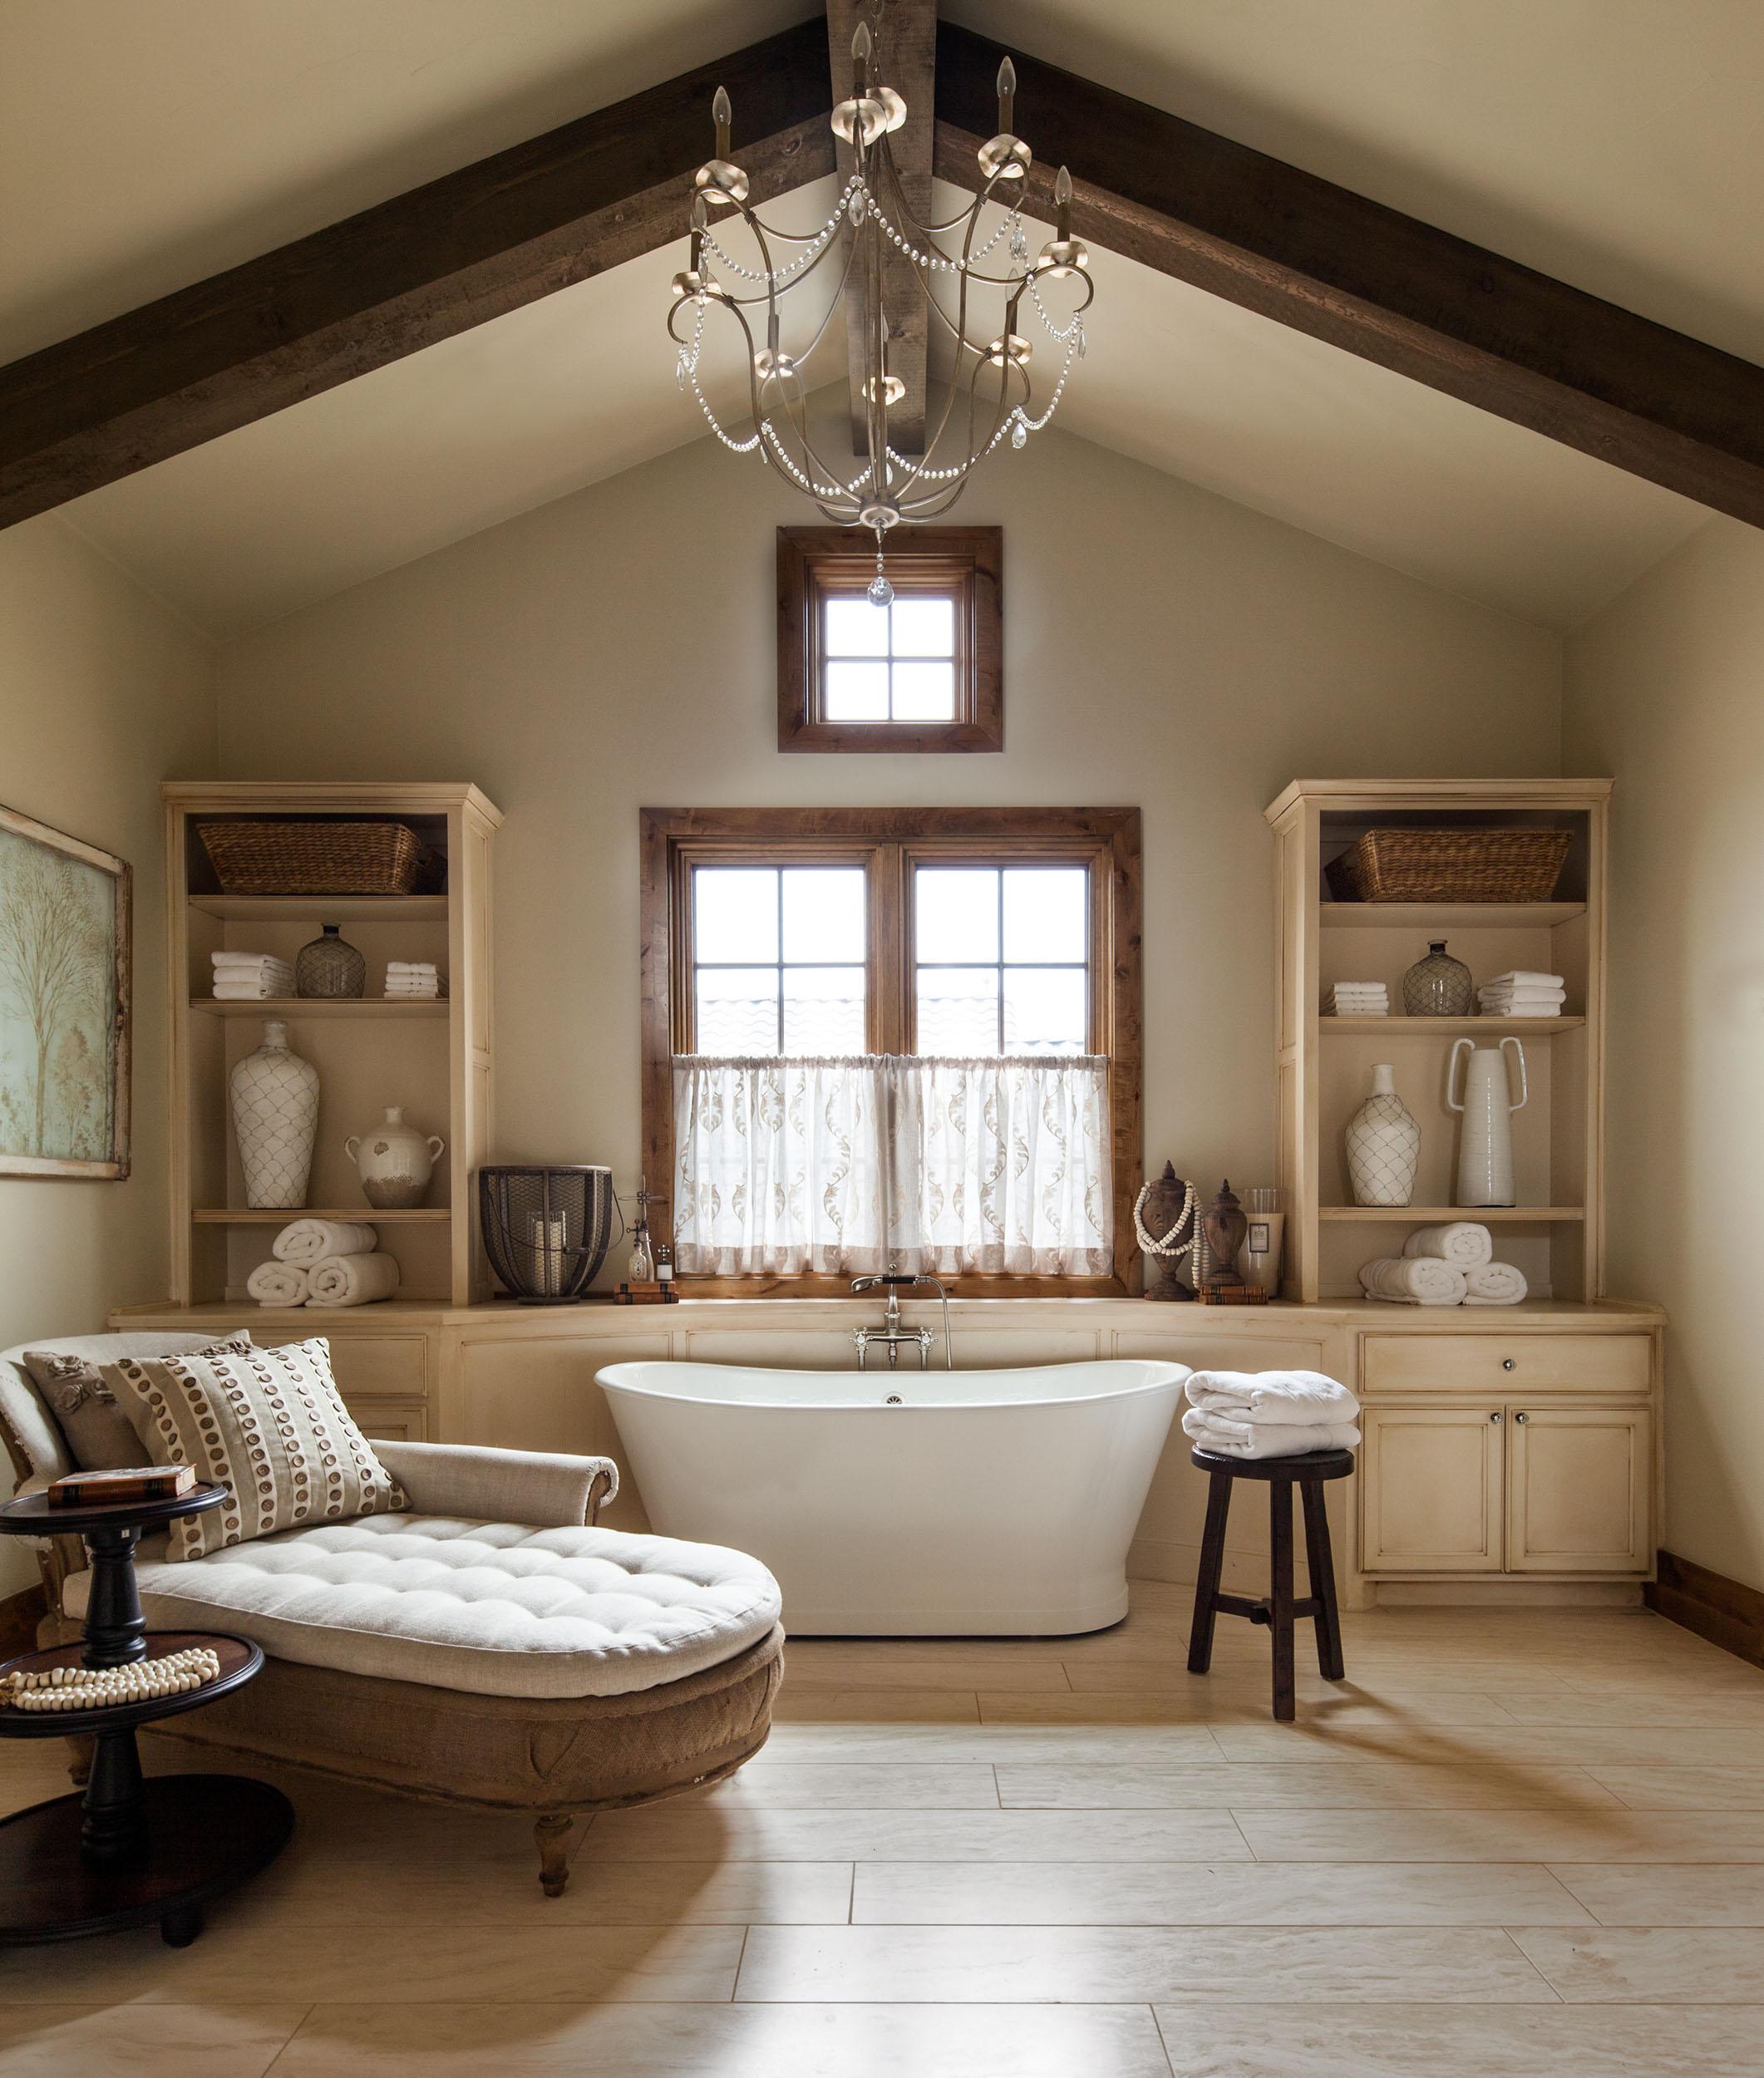 austin-house-master-bathroom-interior-design.jpg